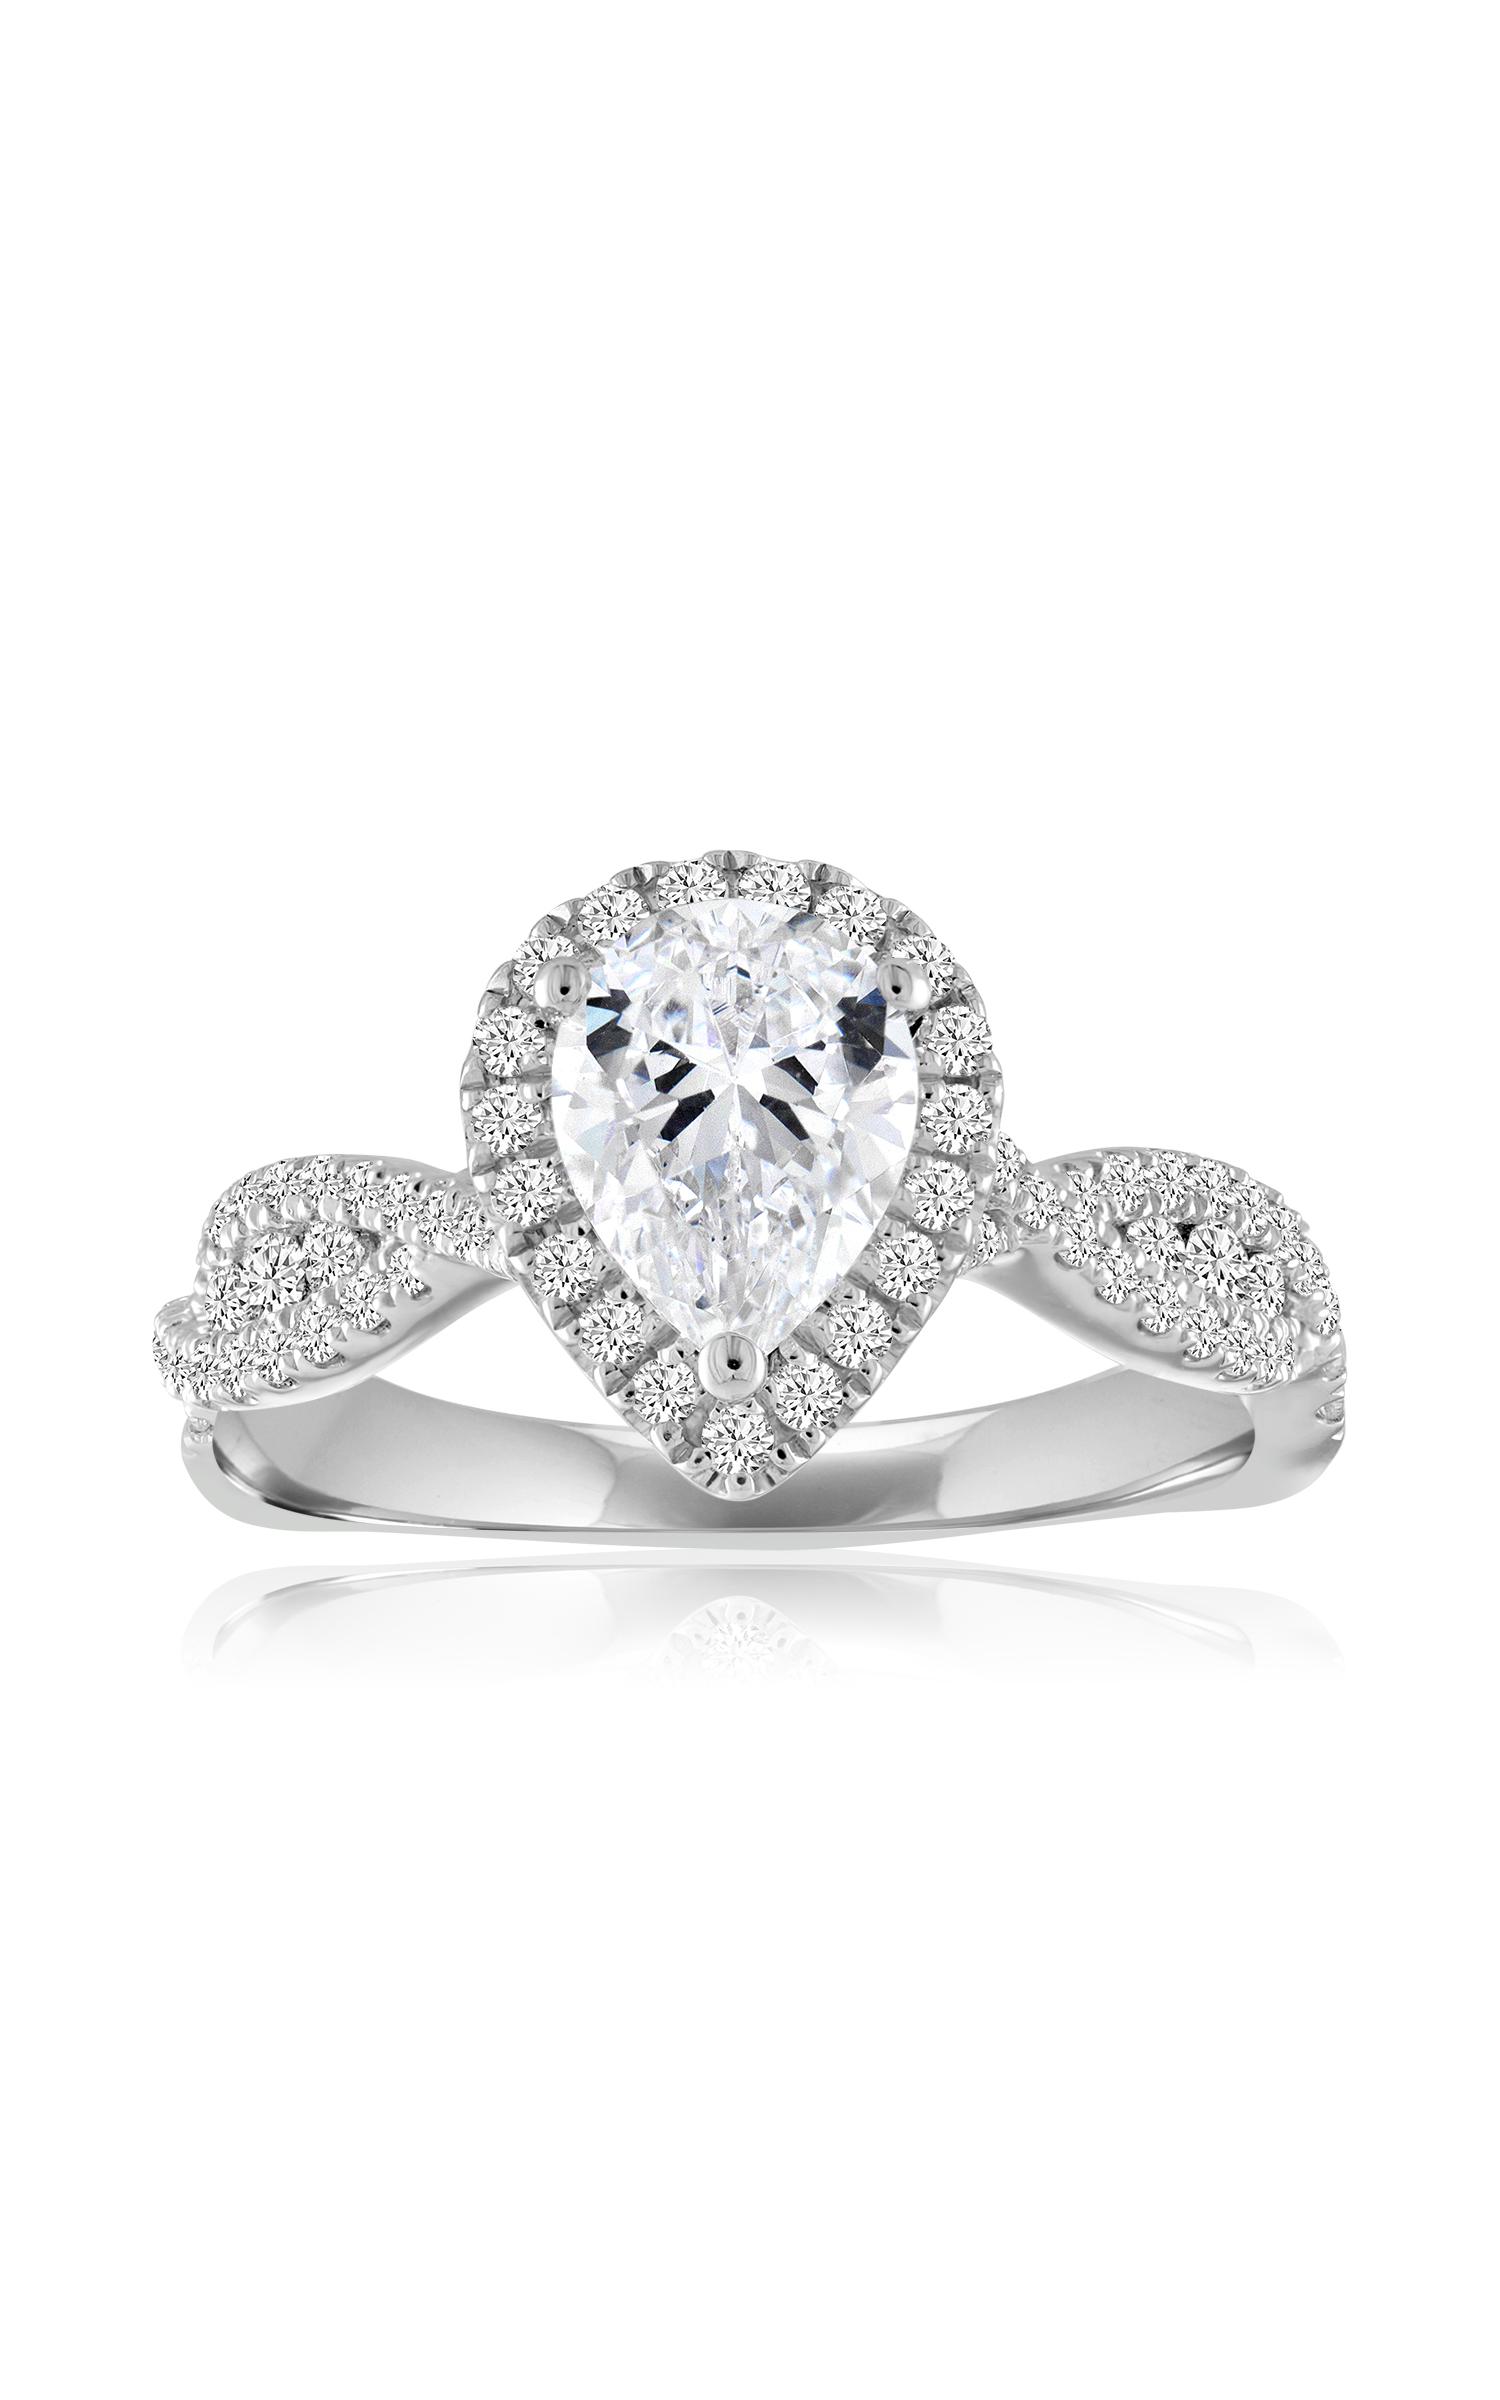 Imagine Bridal Engagement Ring 60736D-1/2 product image